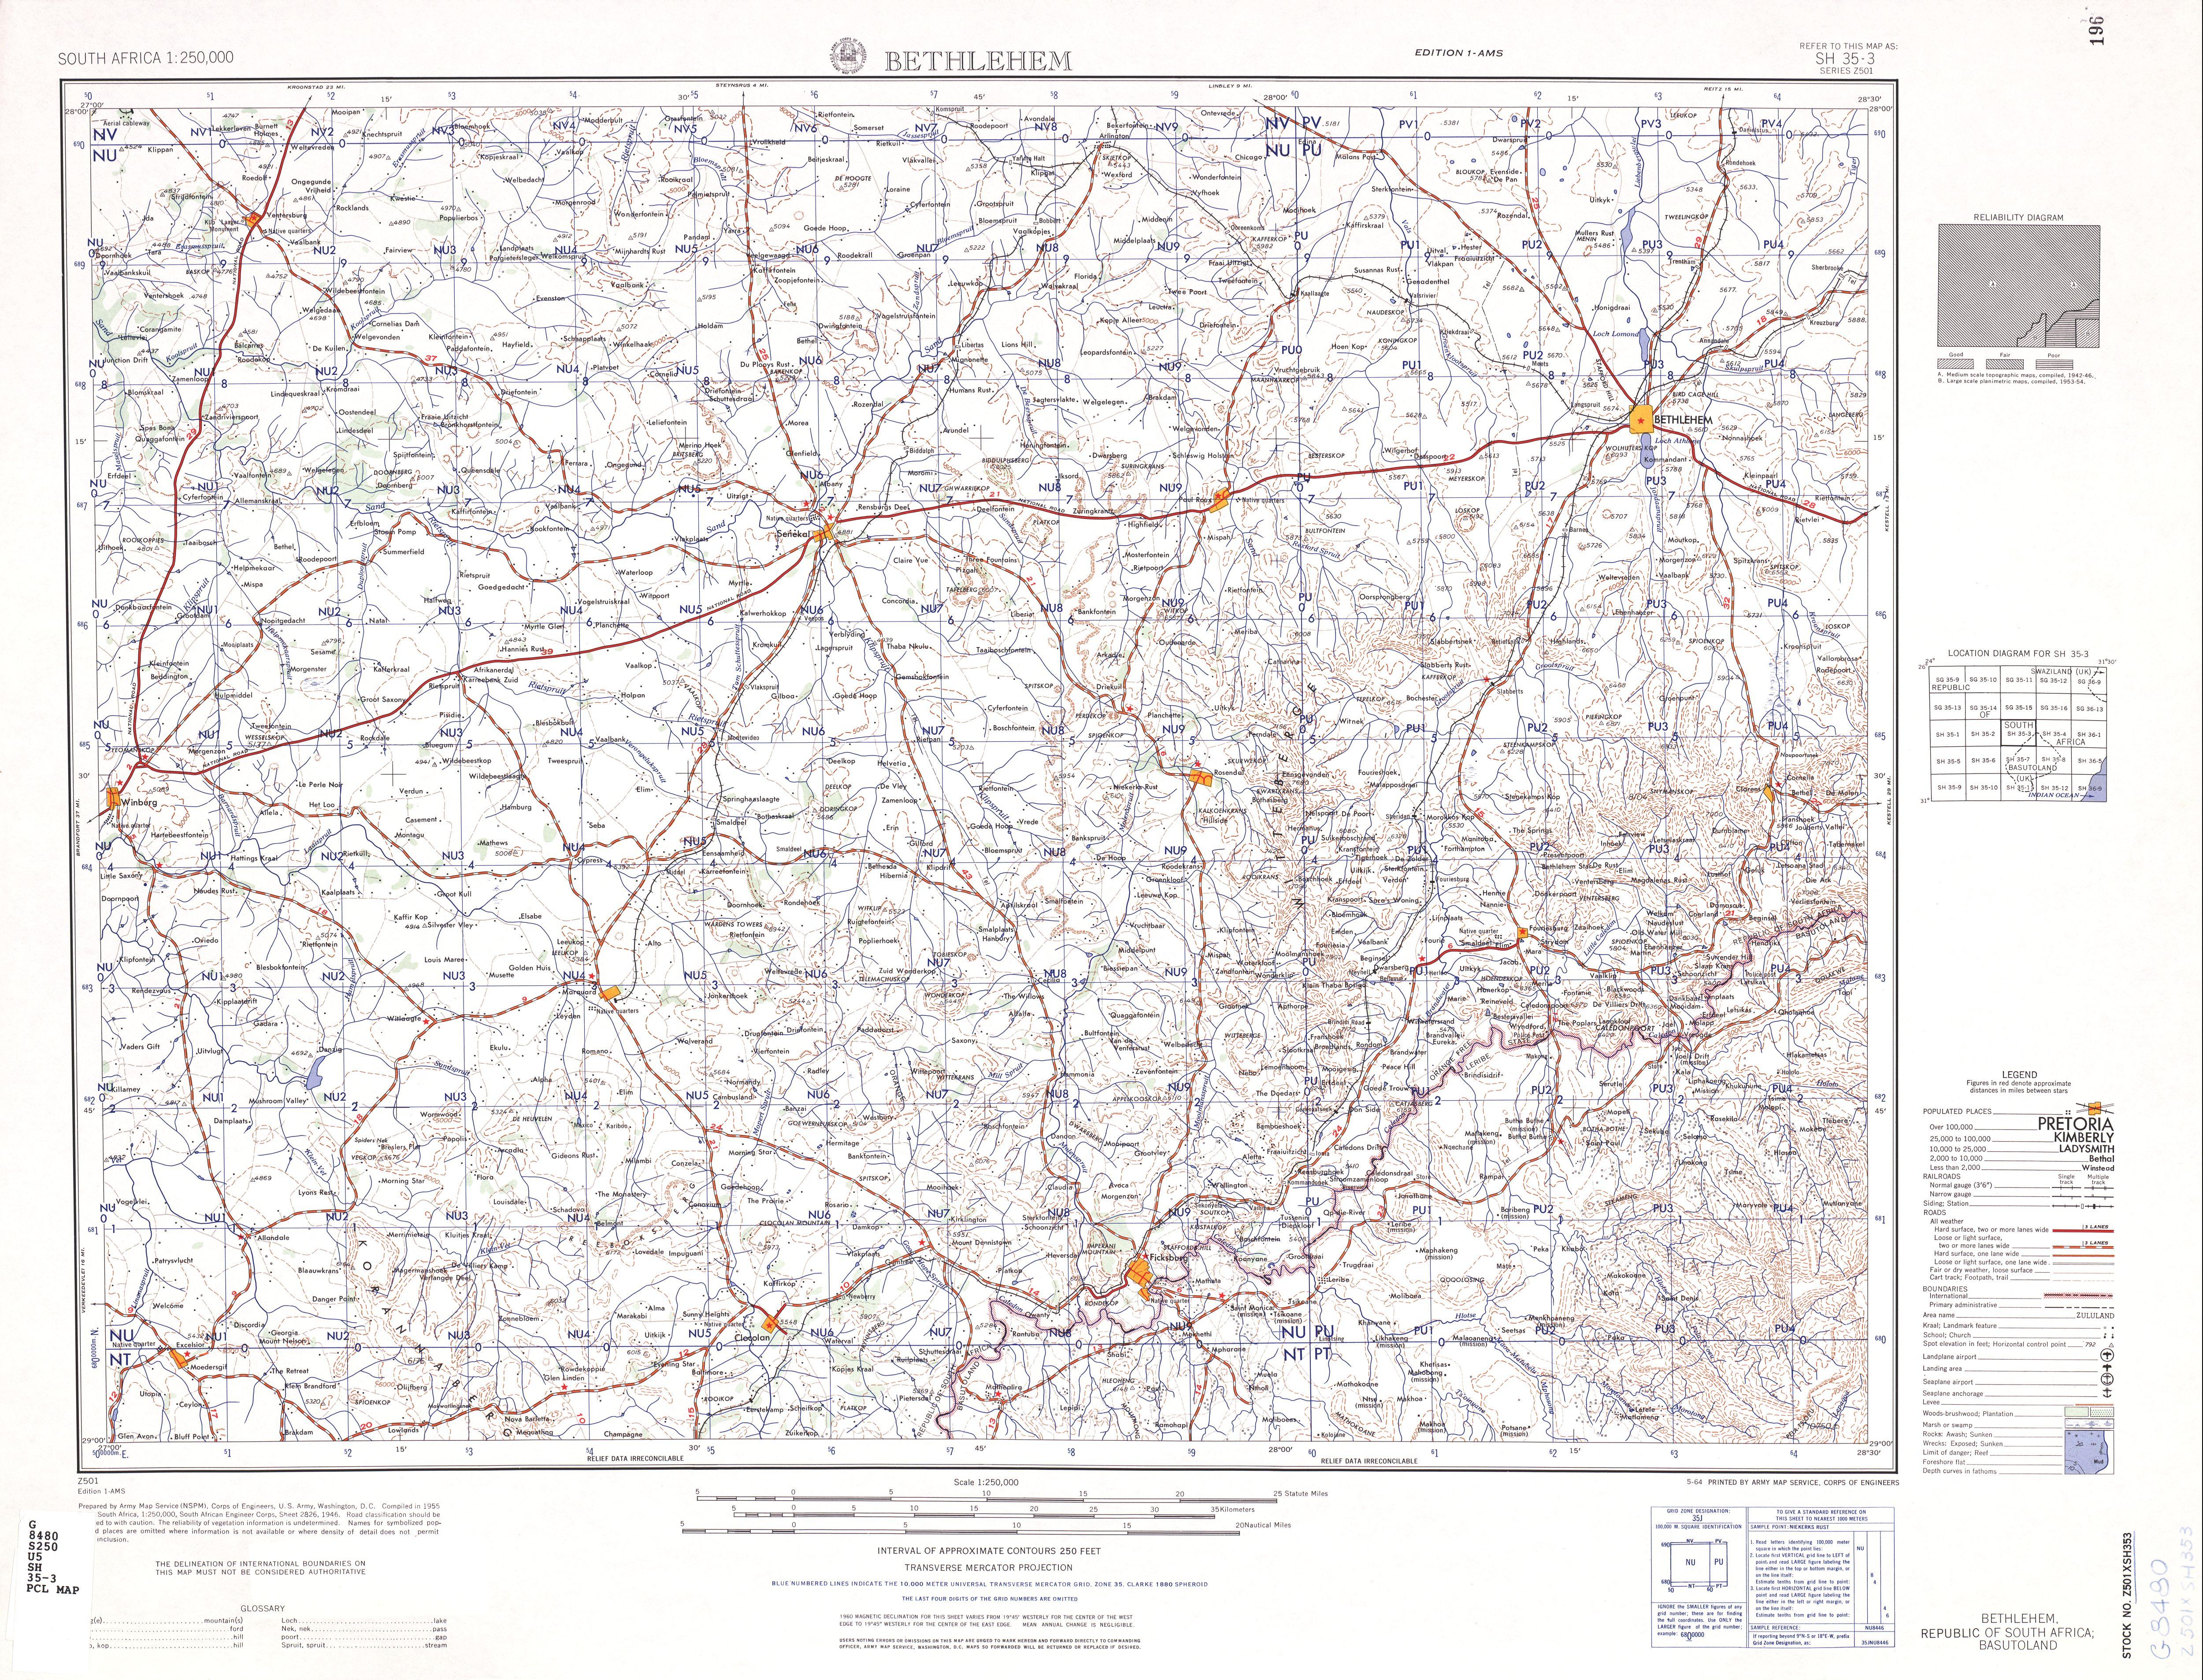 Hoja Bethlehem del Mapa Topográfico de África Meridional 1954